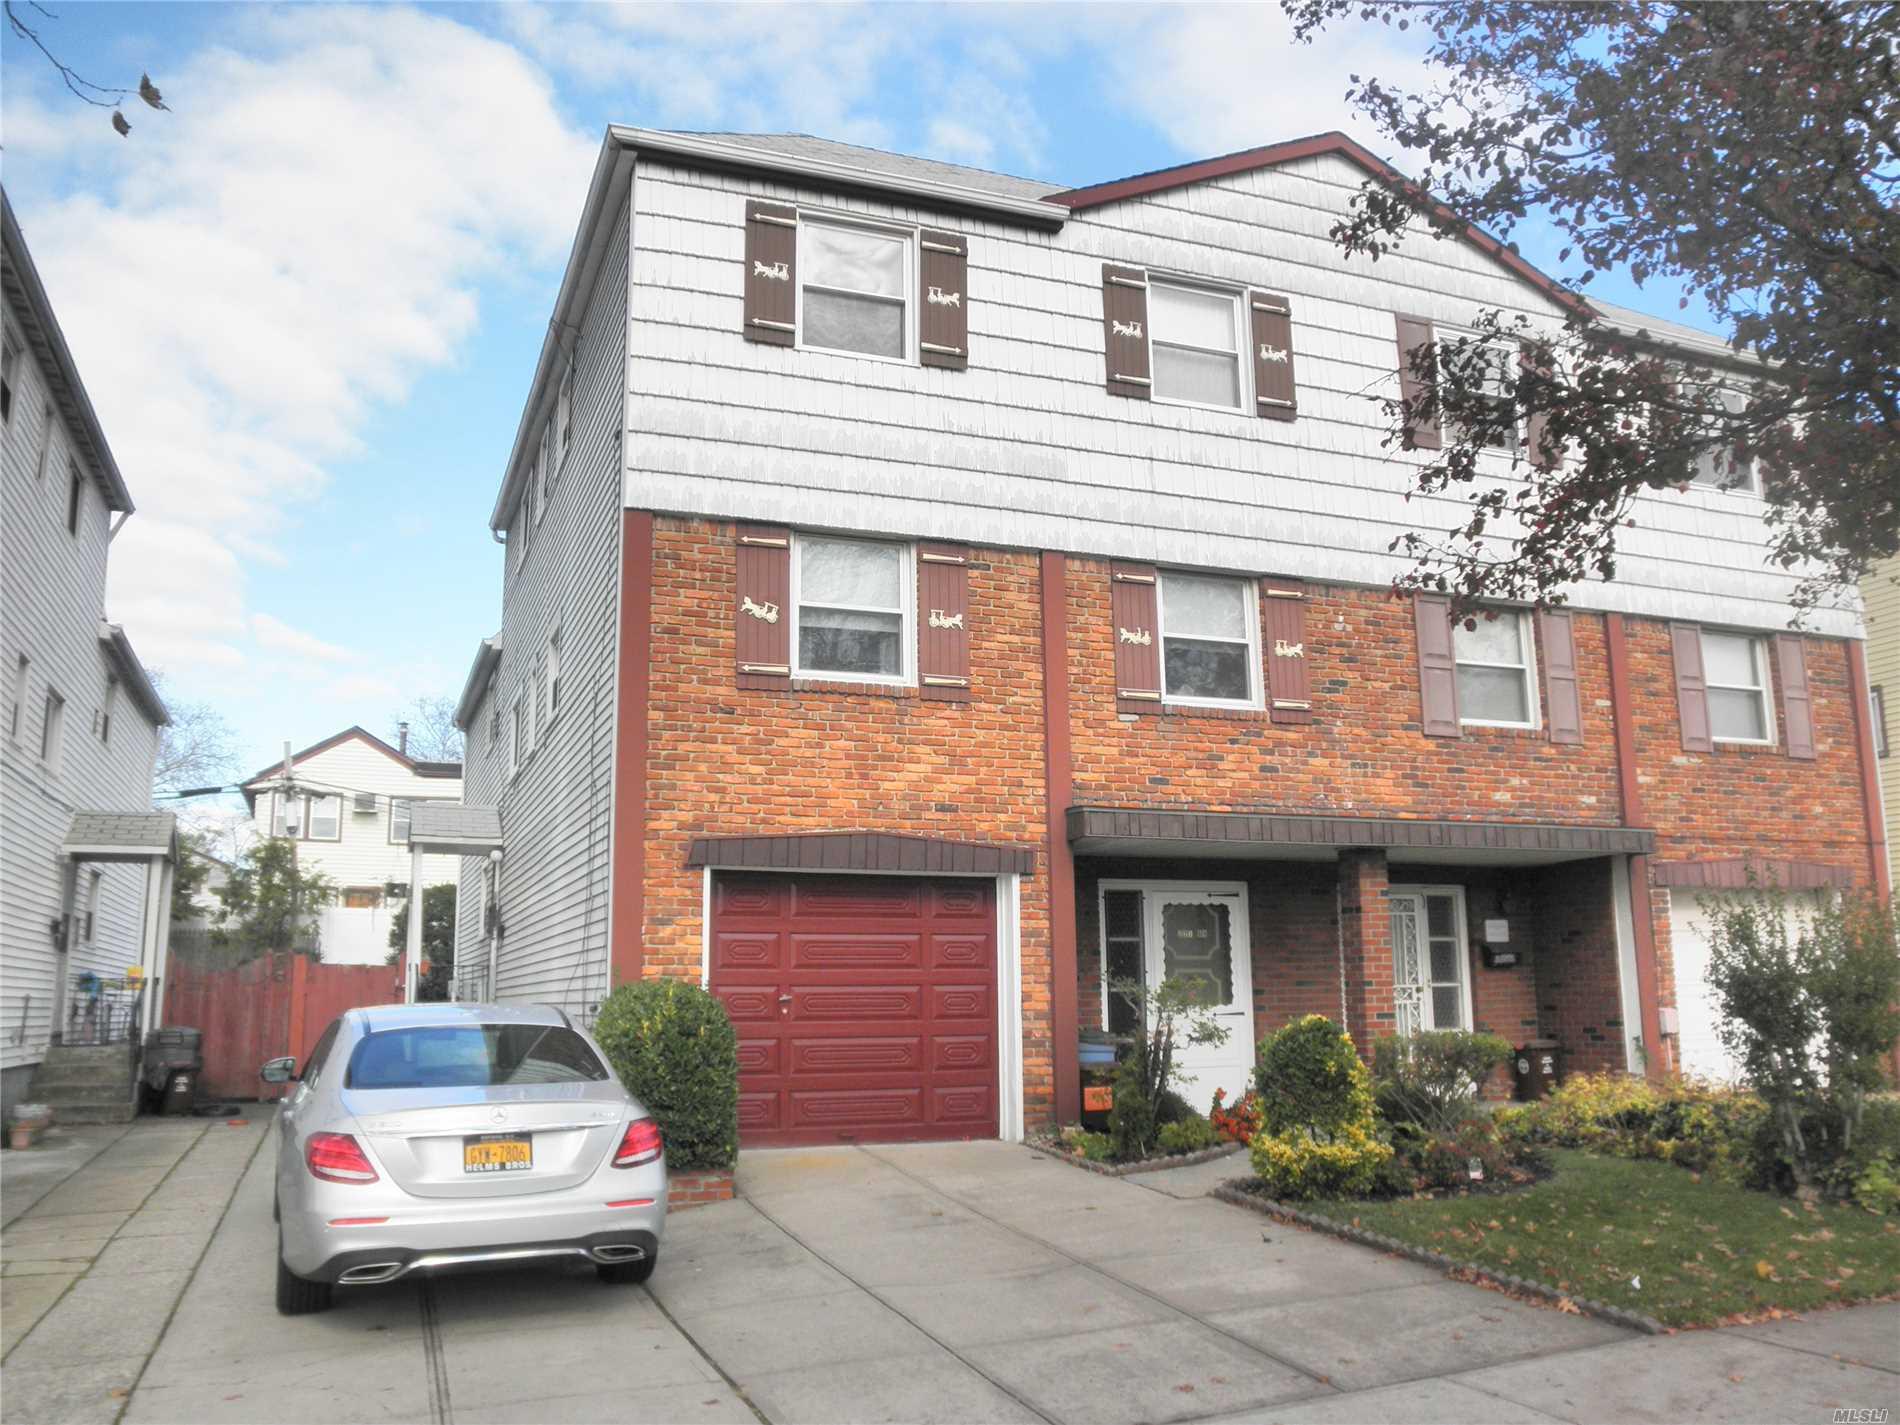 Property for sale at 221-69 Horace Harding Expressway, Bayside NY 11364, Bayside,  New York 11364